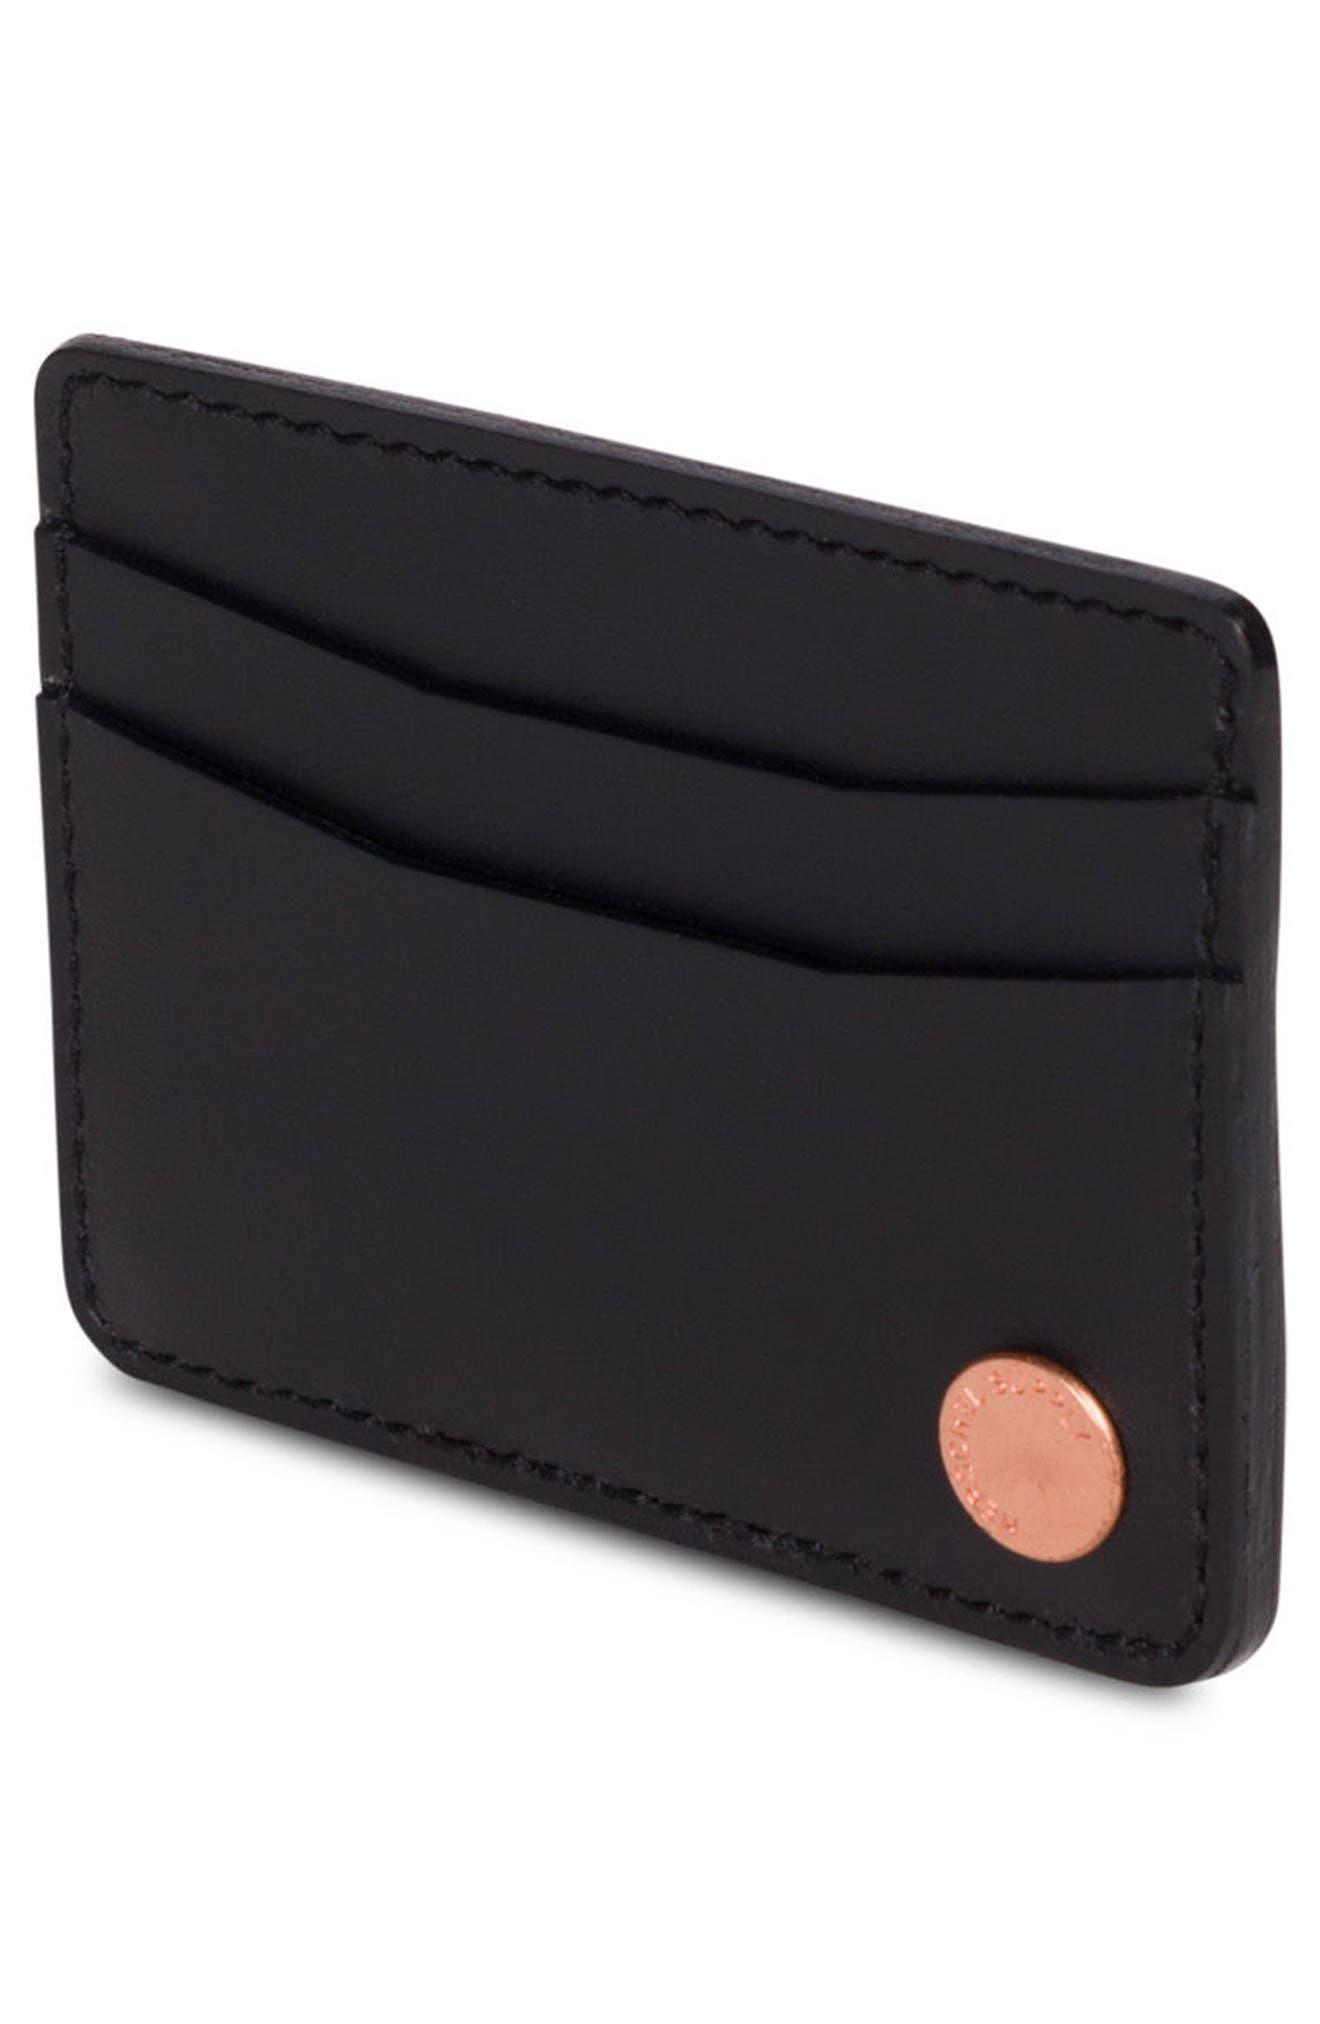 Ace Leather Card Case,                             Alternate thumbnail 3, color,                             001